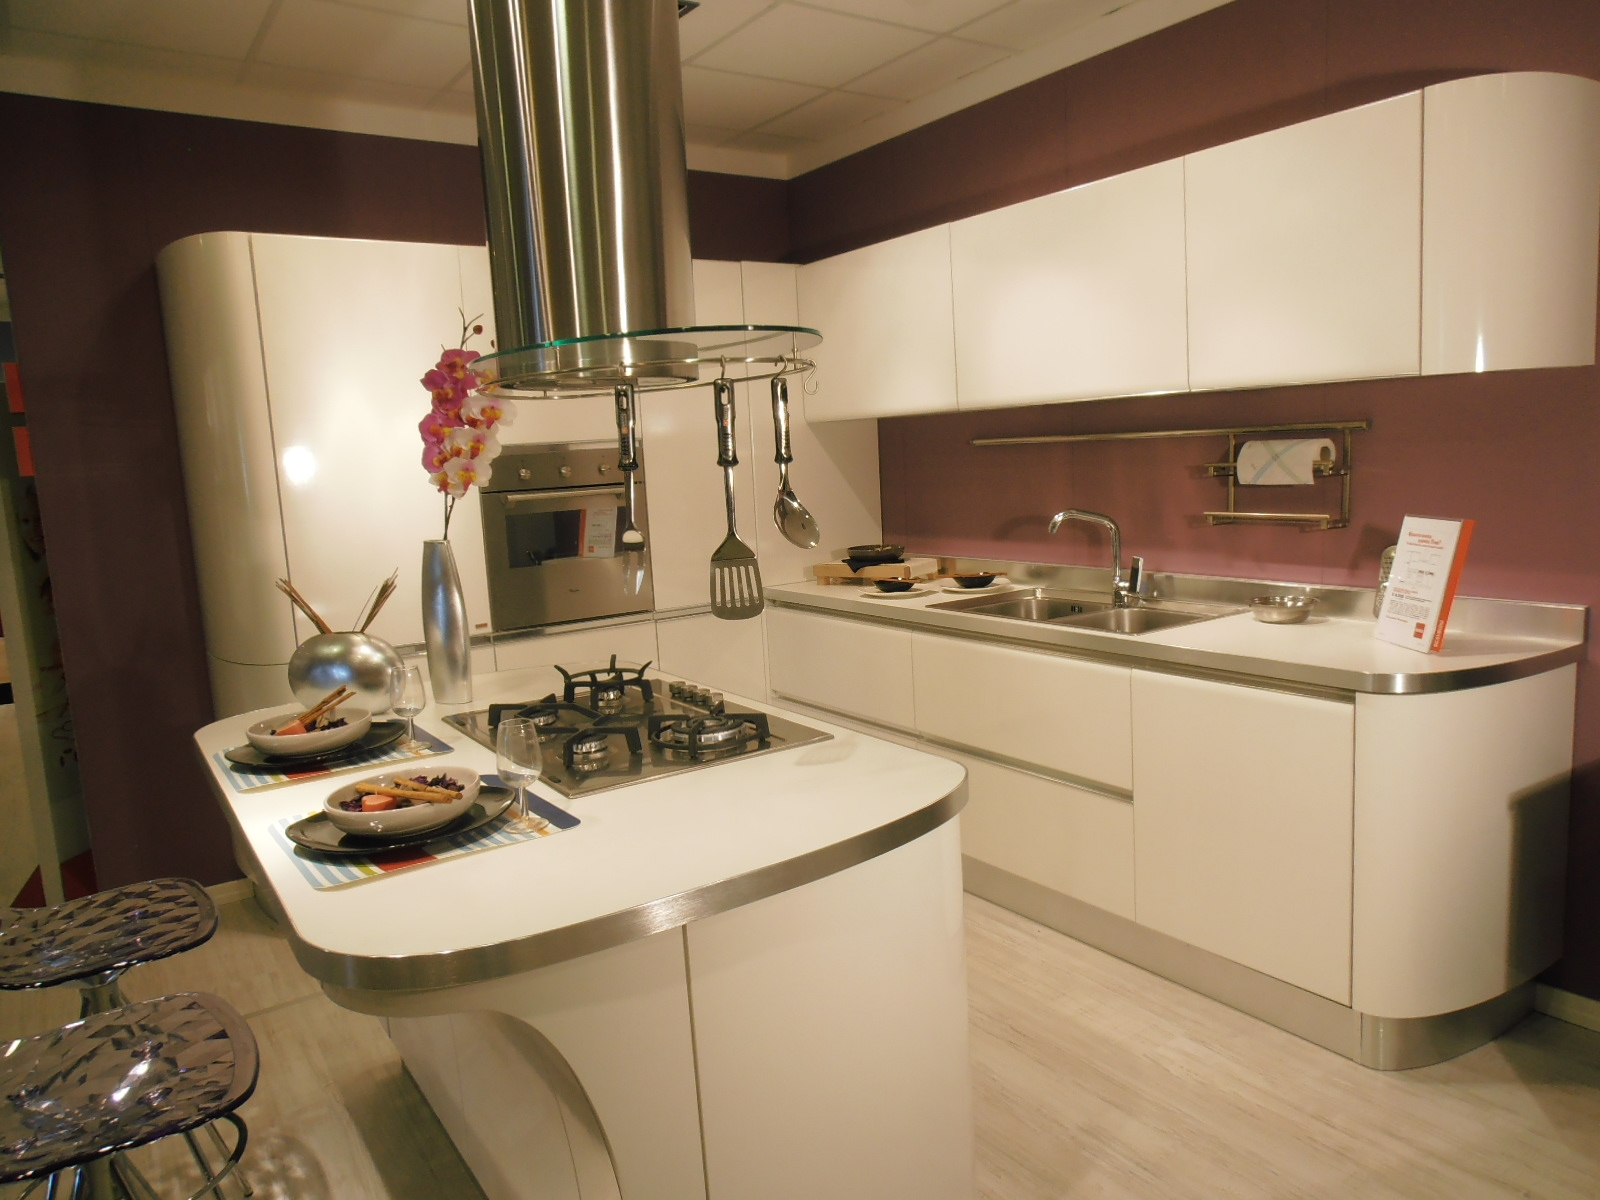 Cucina scavolini tess moderna cucine a prezzi scontati for Cucine scavolini prezzi